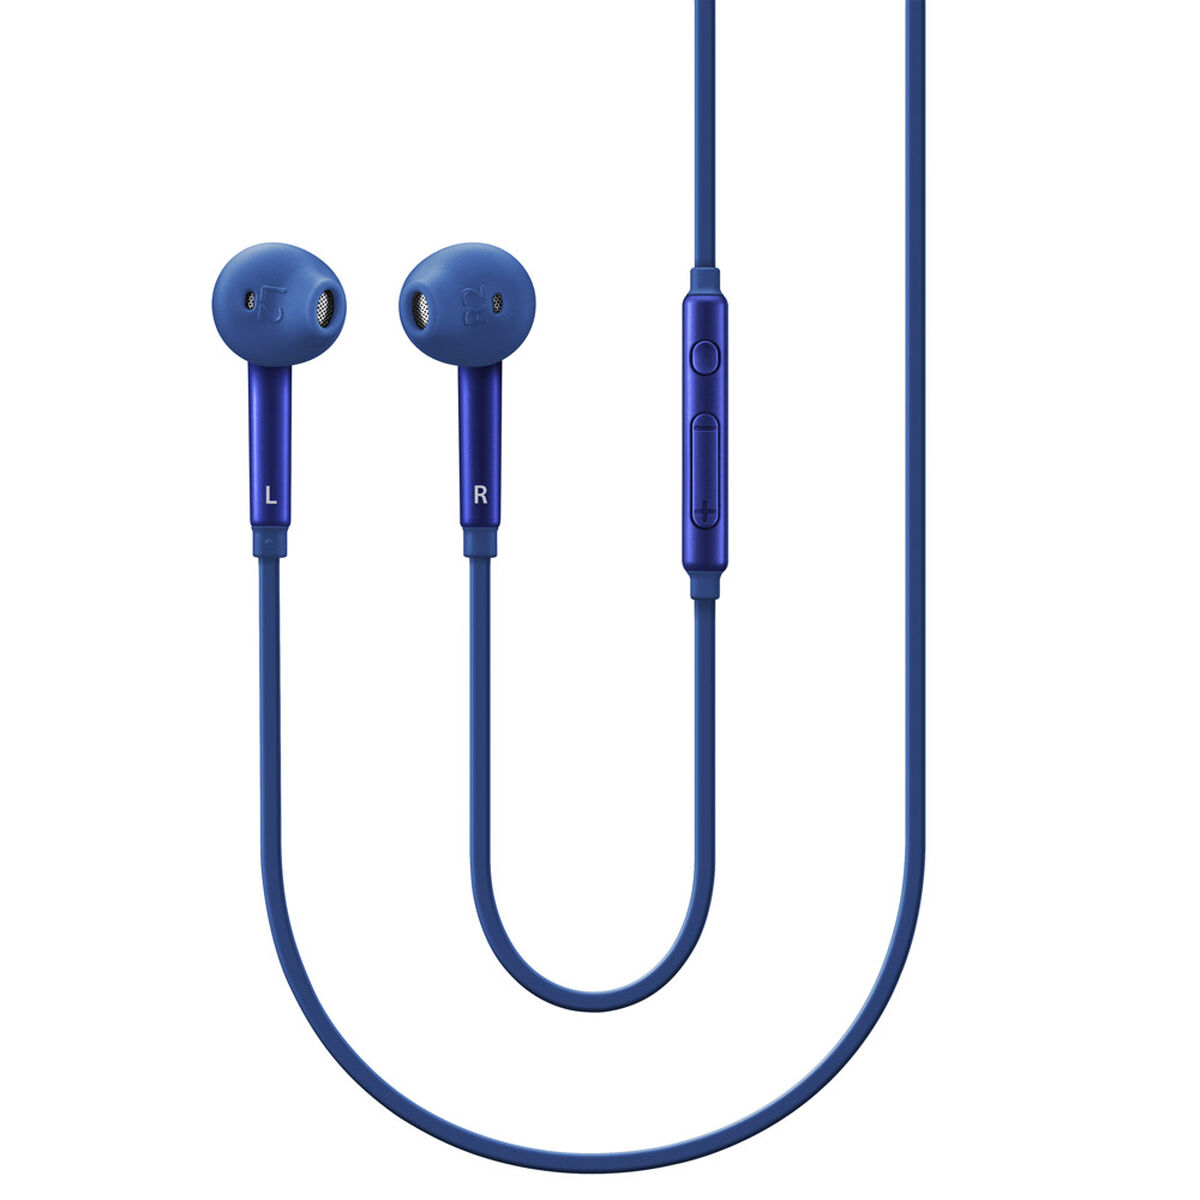 Audífonos In Ear Samsung Fit EG920 Azules